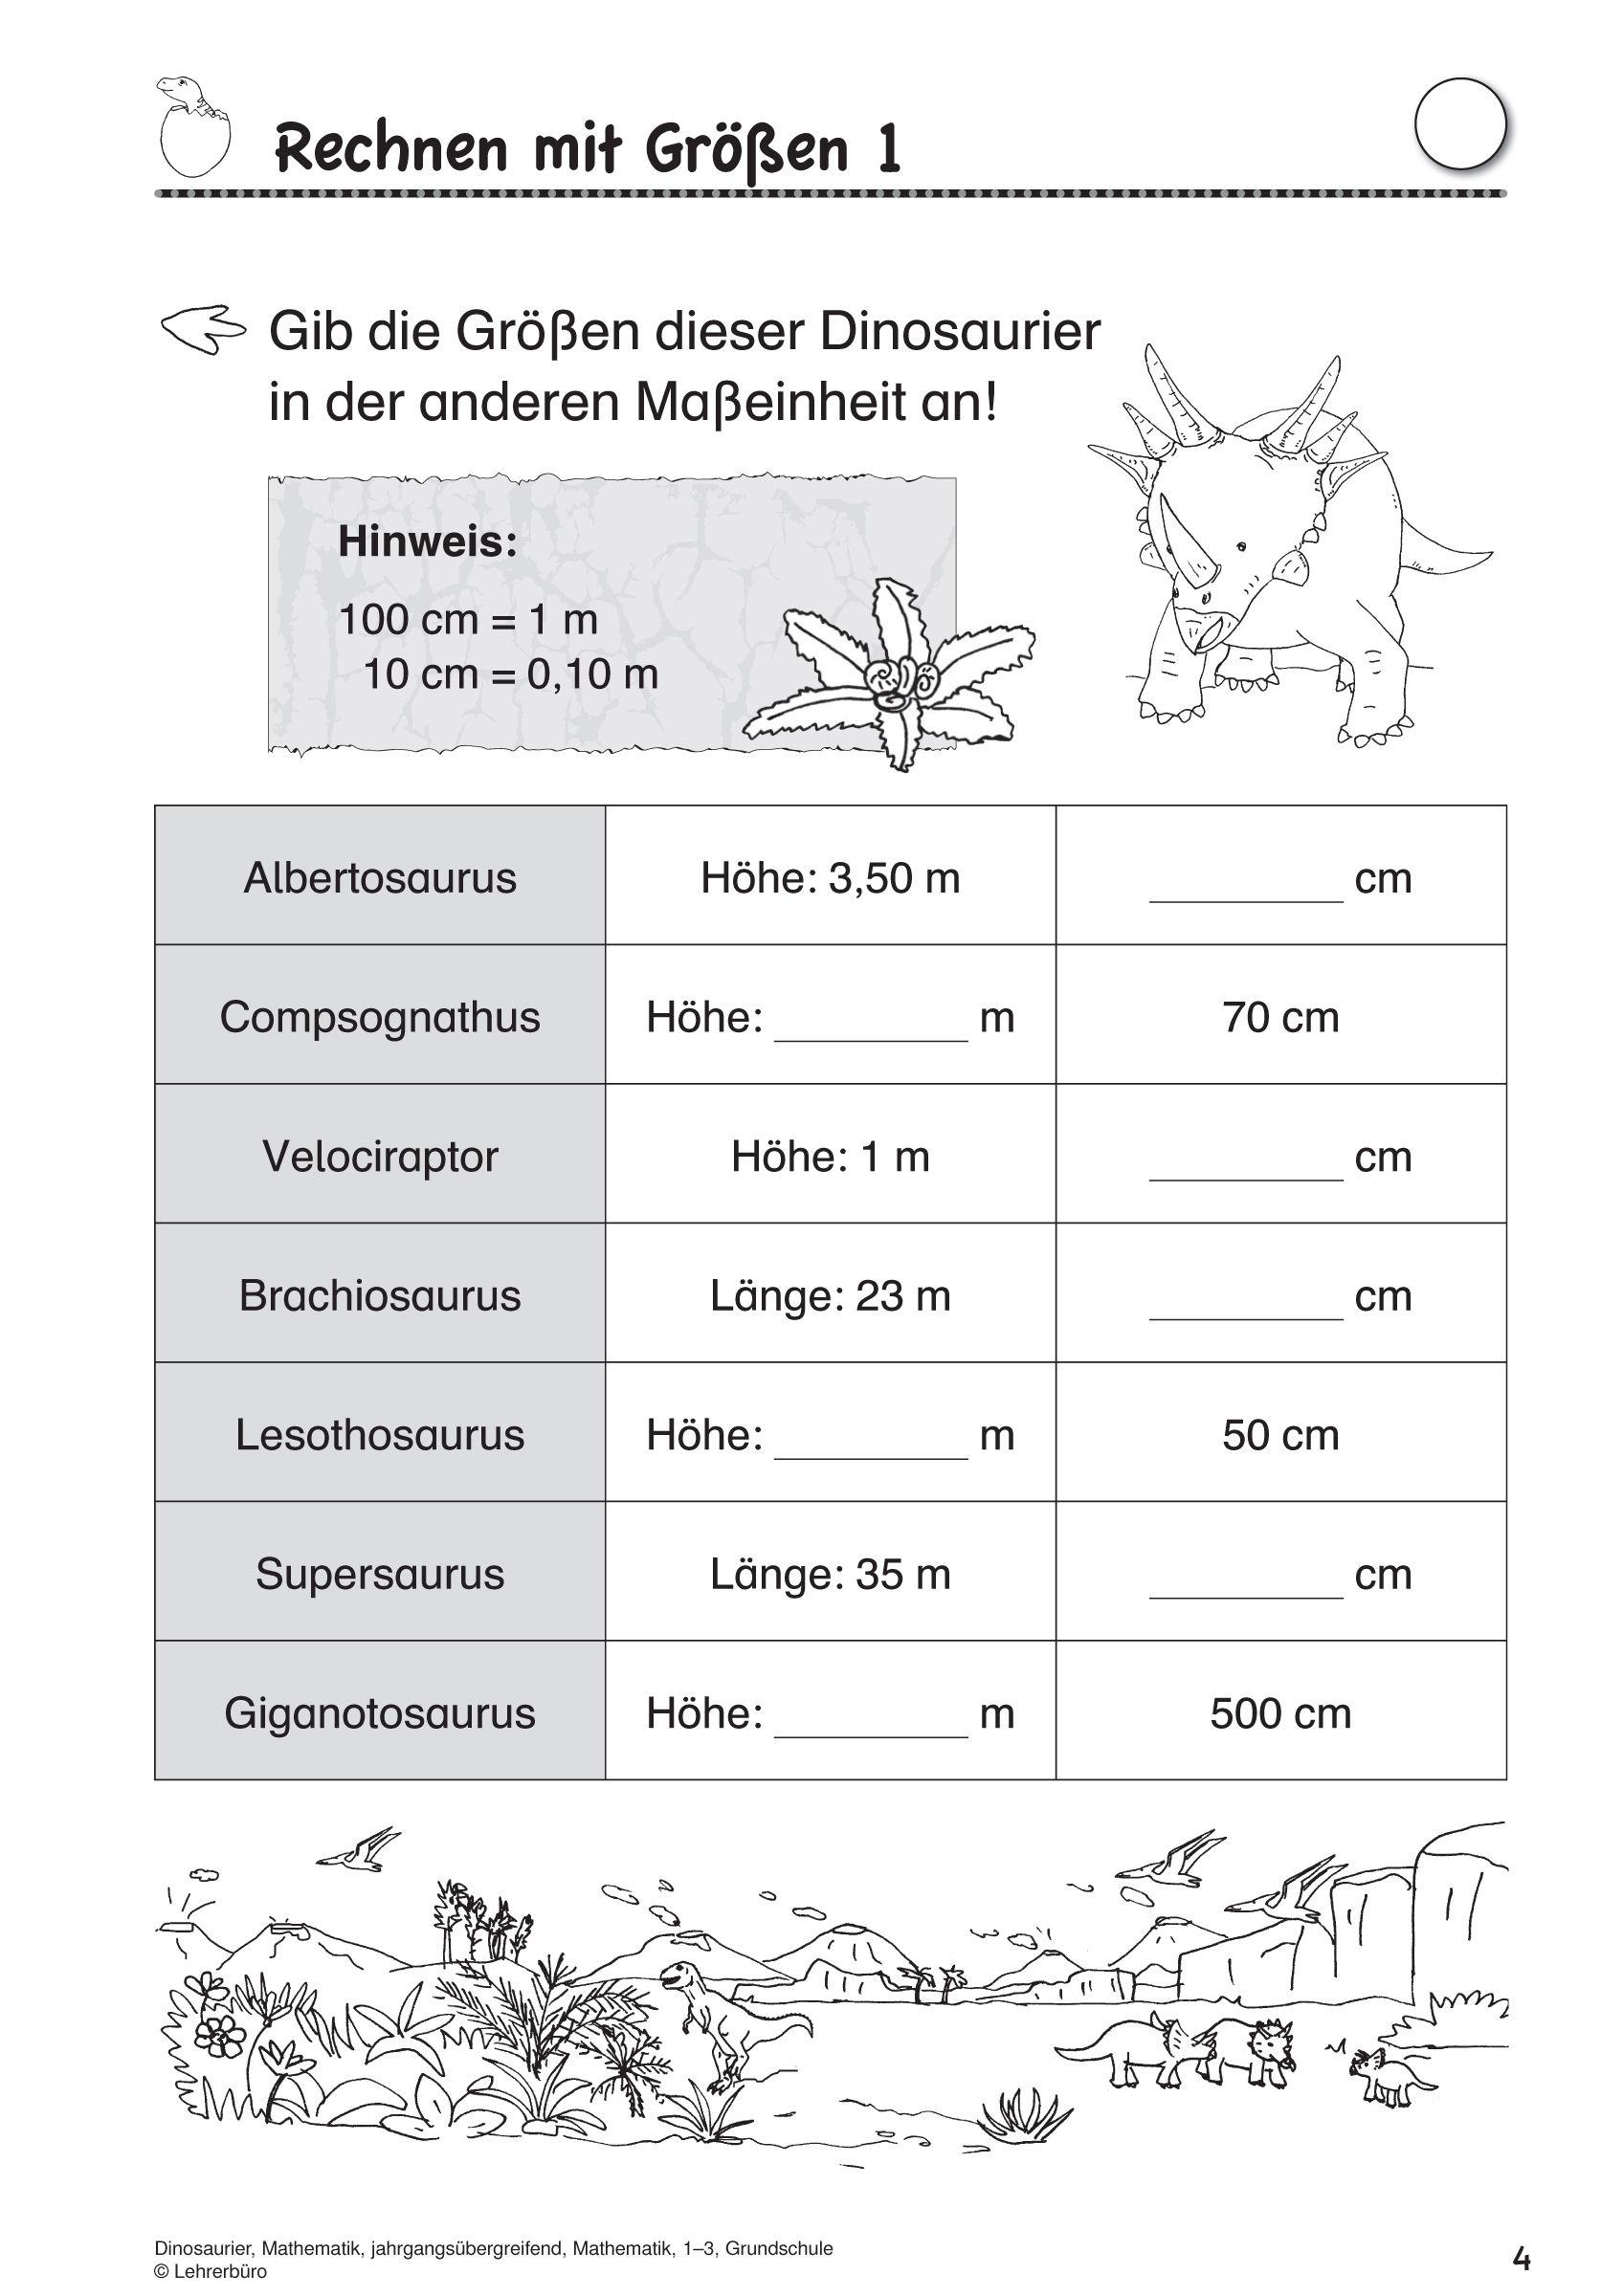 Arbeitsblatter Grundschule Lehrerburo In Dinosaurier Grundschule Arbeitsblatter Arbeitsblatter Grundschule Grundschule Lehrerburo